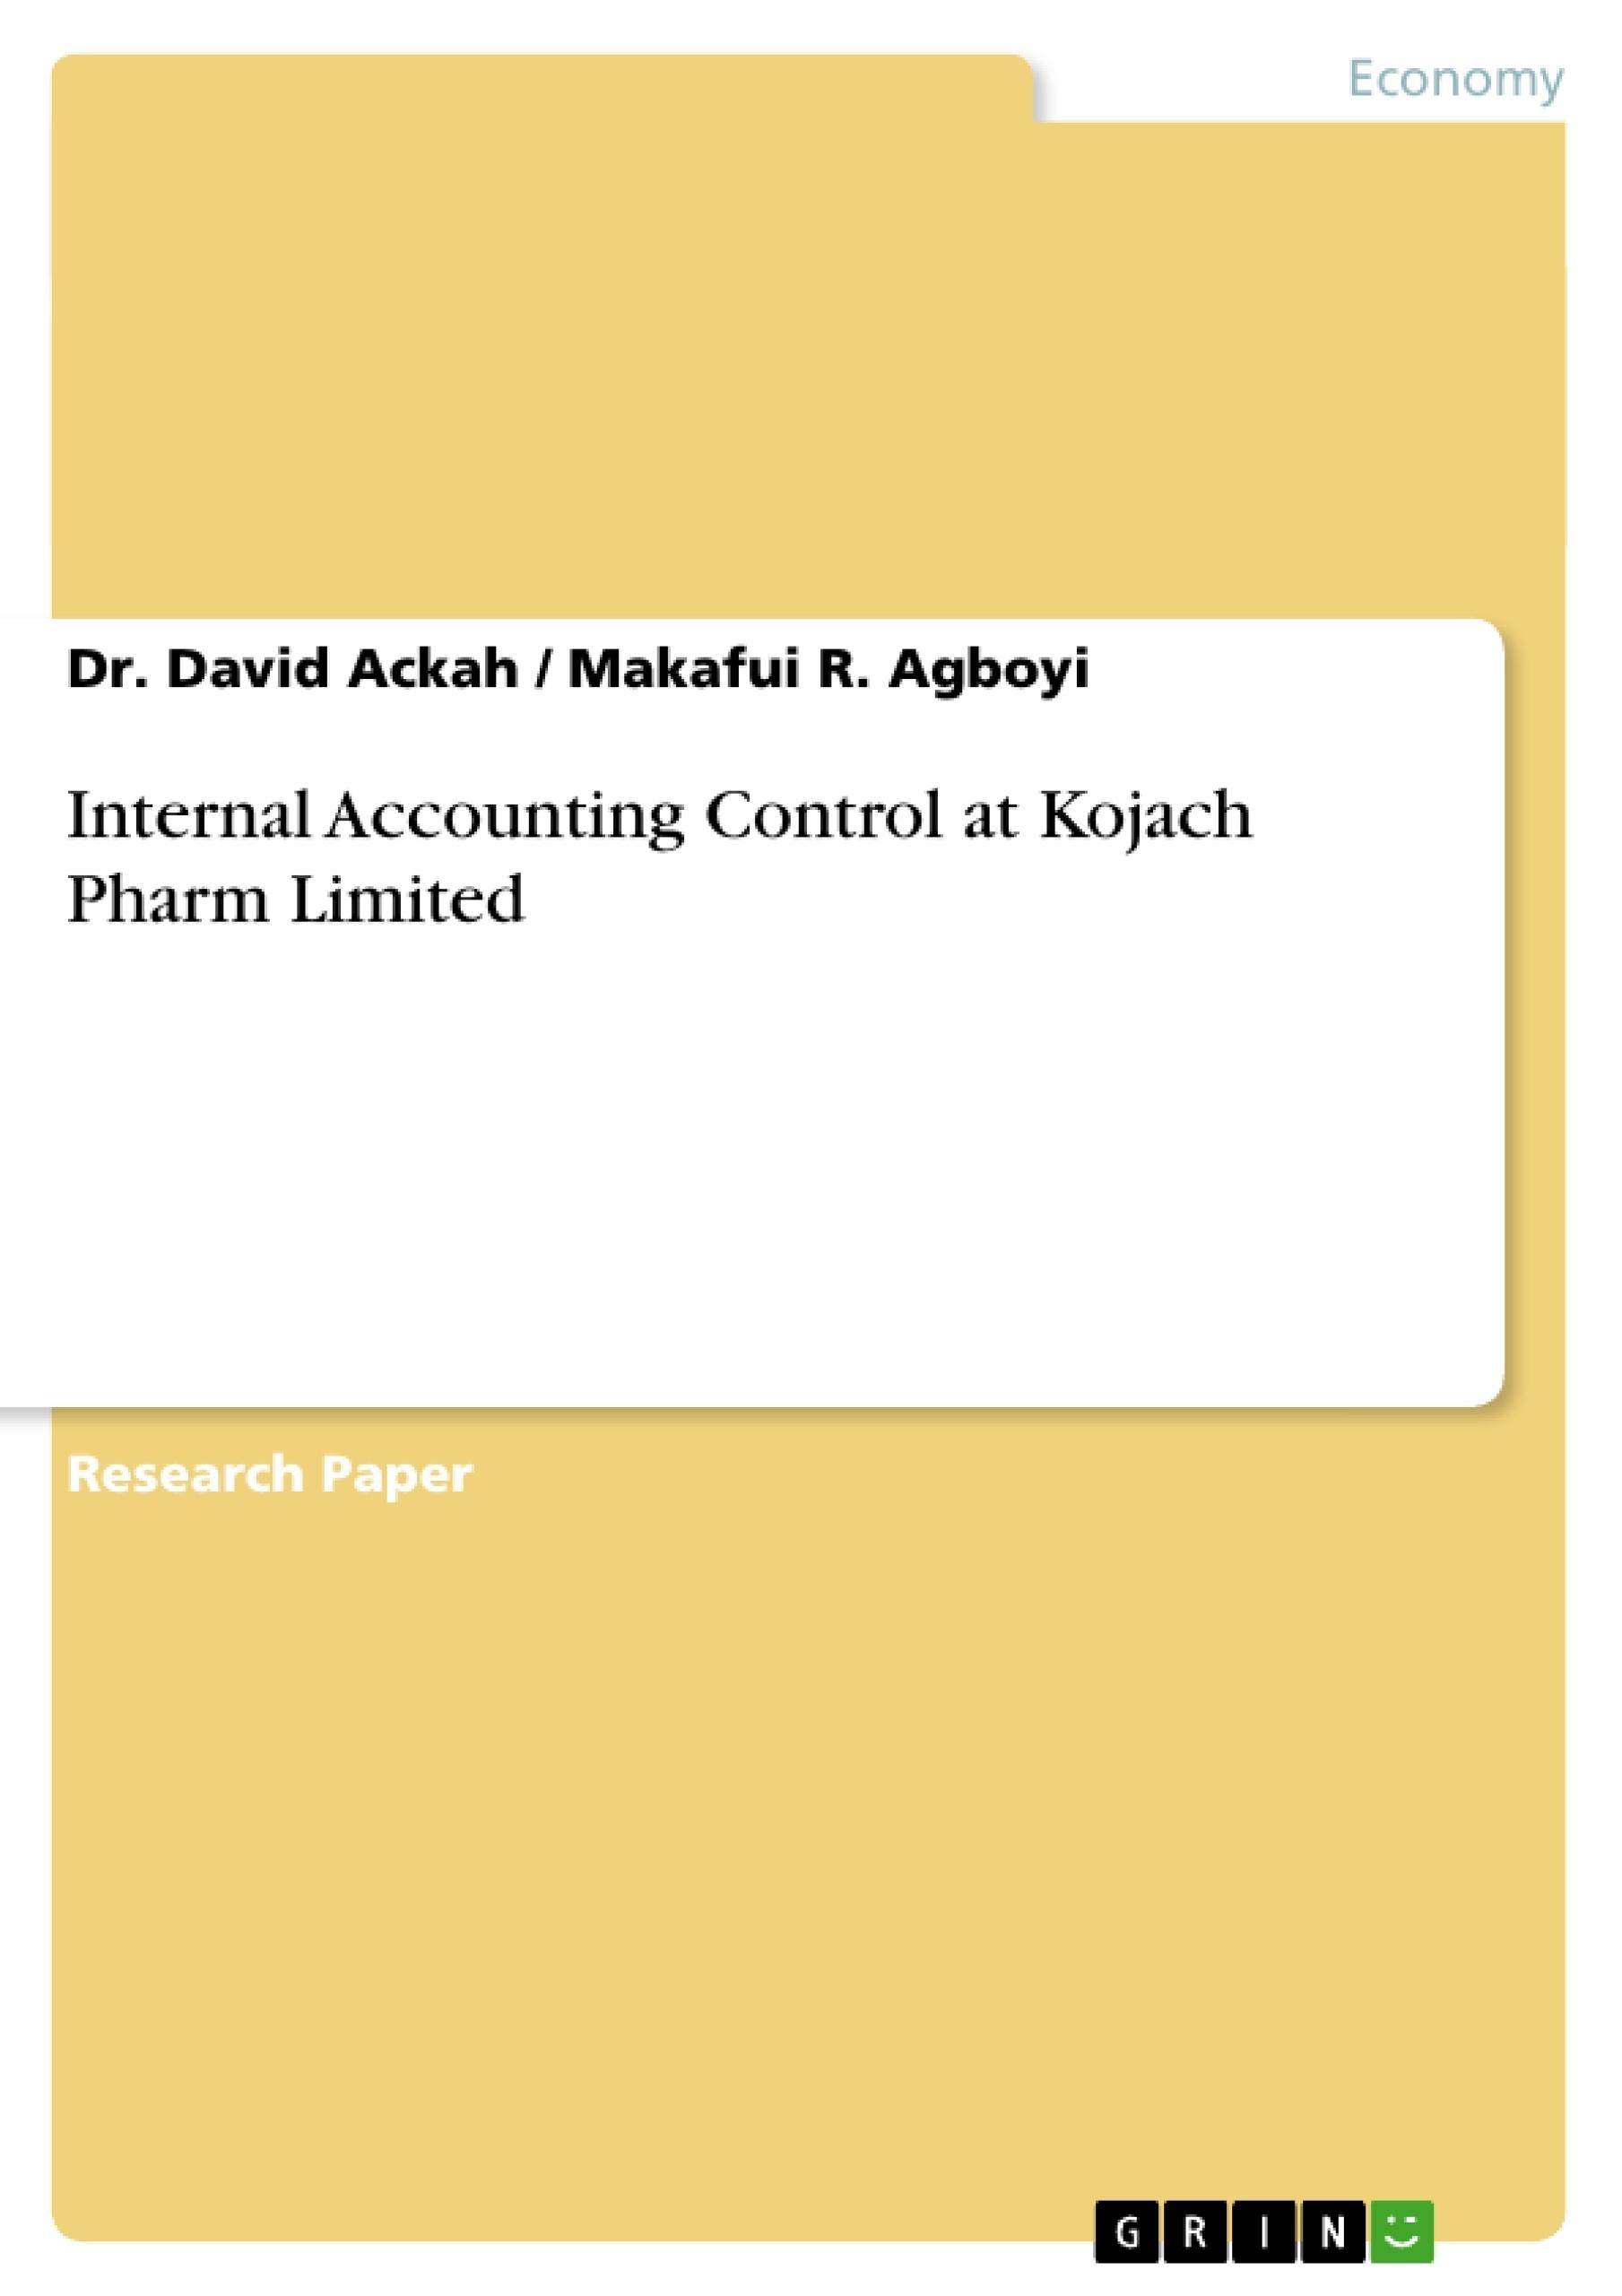 Title: Internal Accounting Control at Kojach Pharm Limited